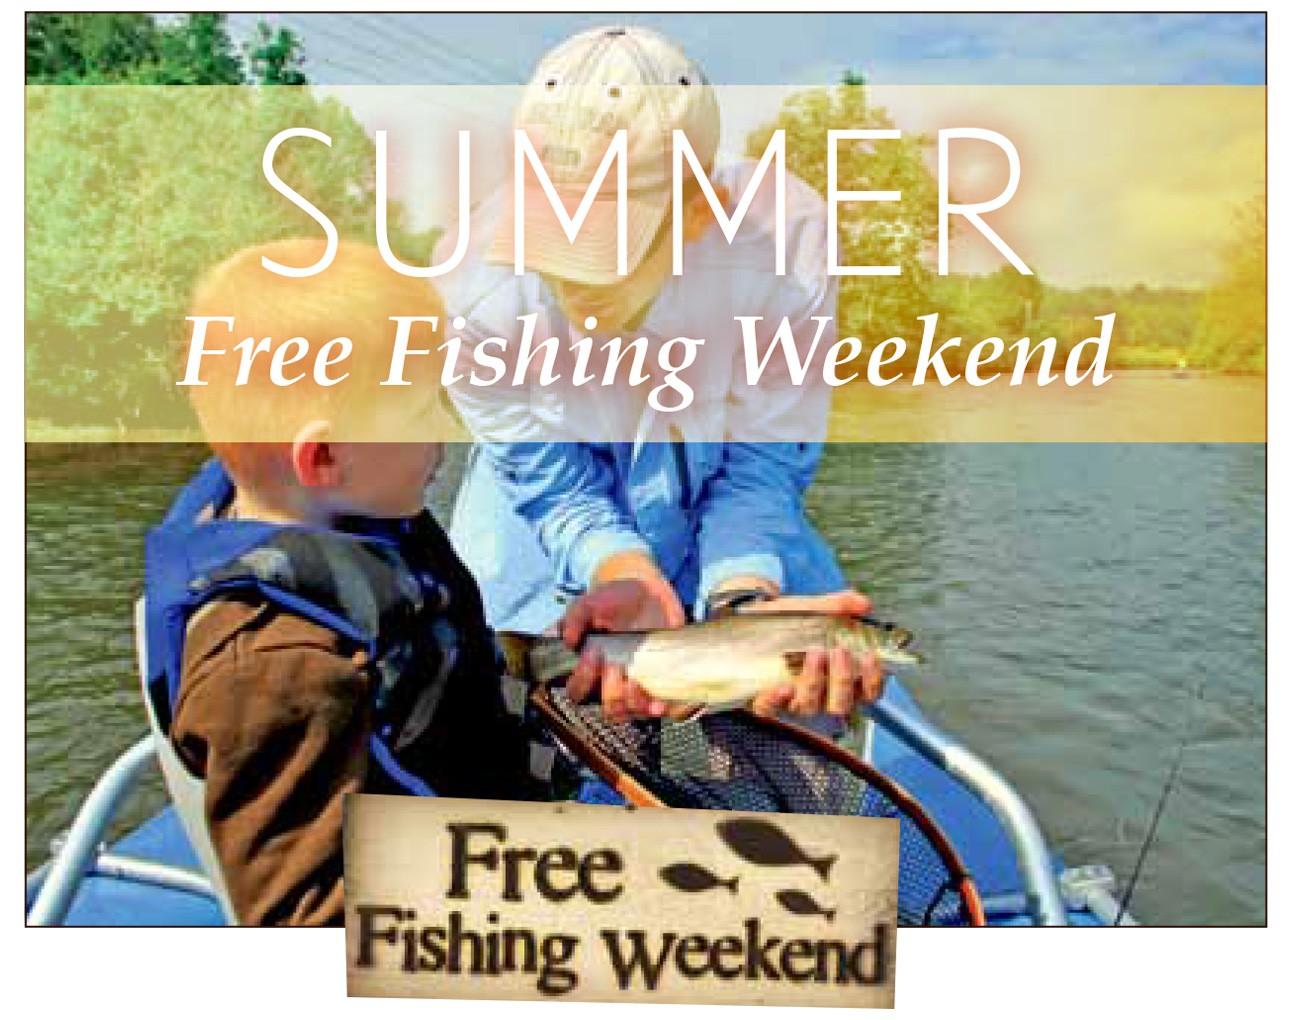 Free fishing weekend west michigan coastal angler for Michigan dnr fishing guide